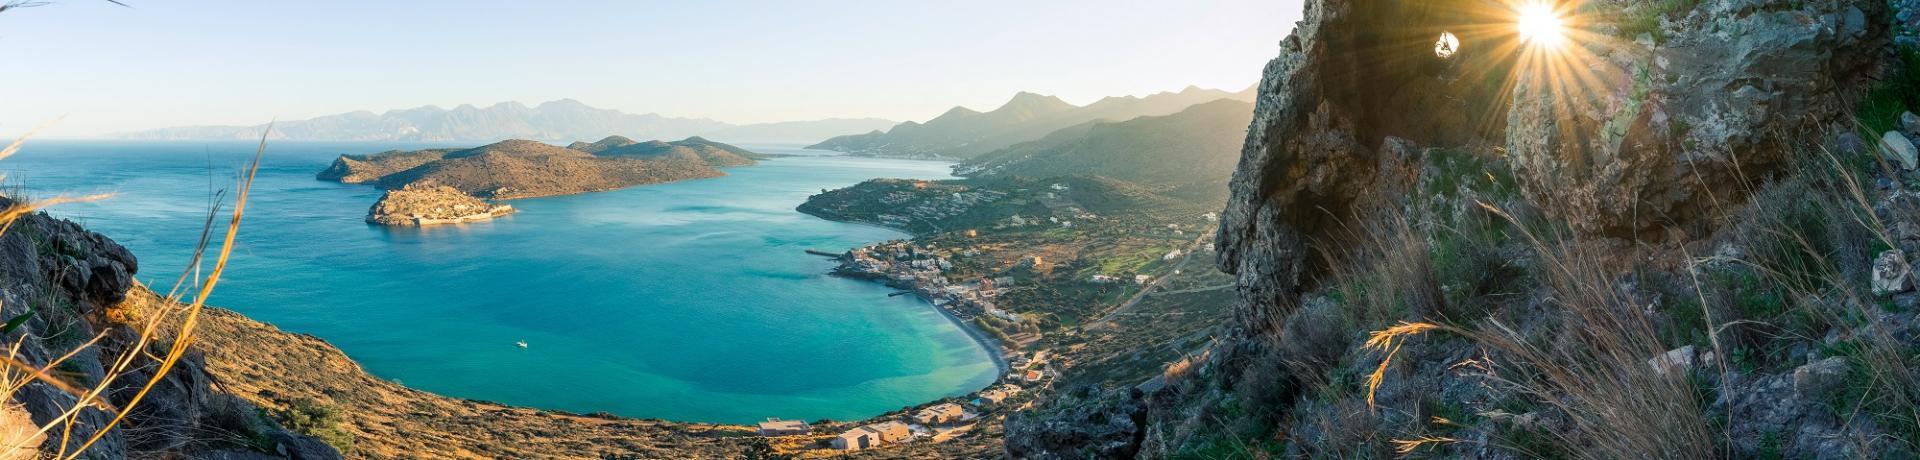 Griechenland-kreta-Emotion_GI-908034012.jpg